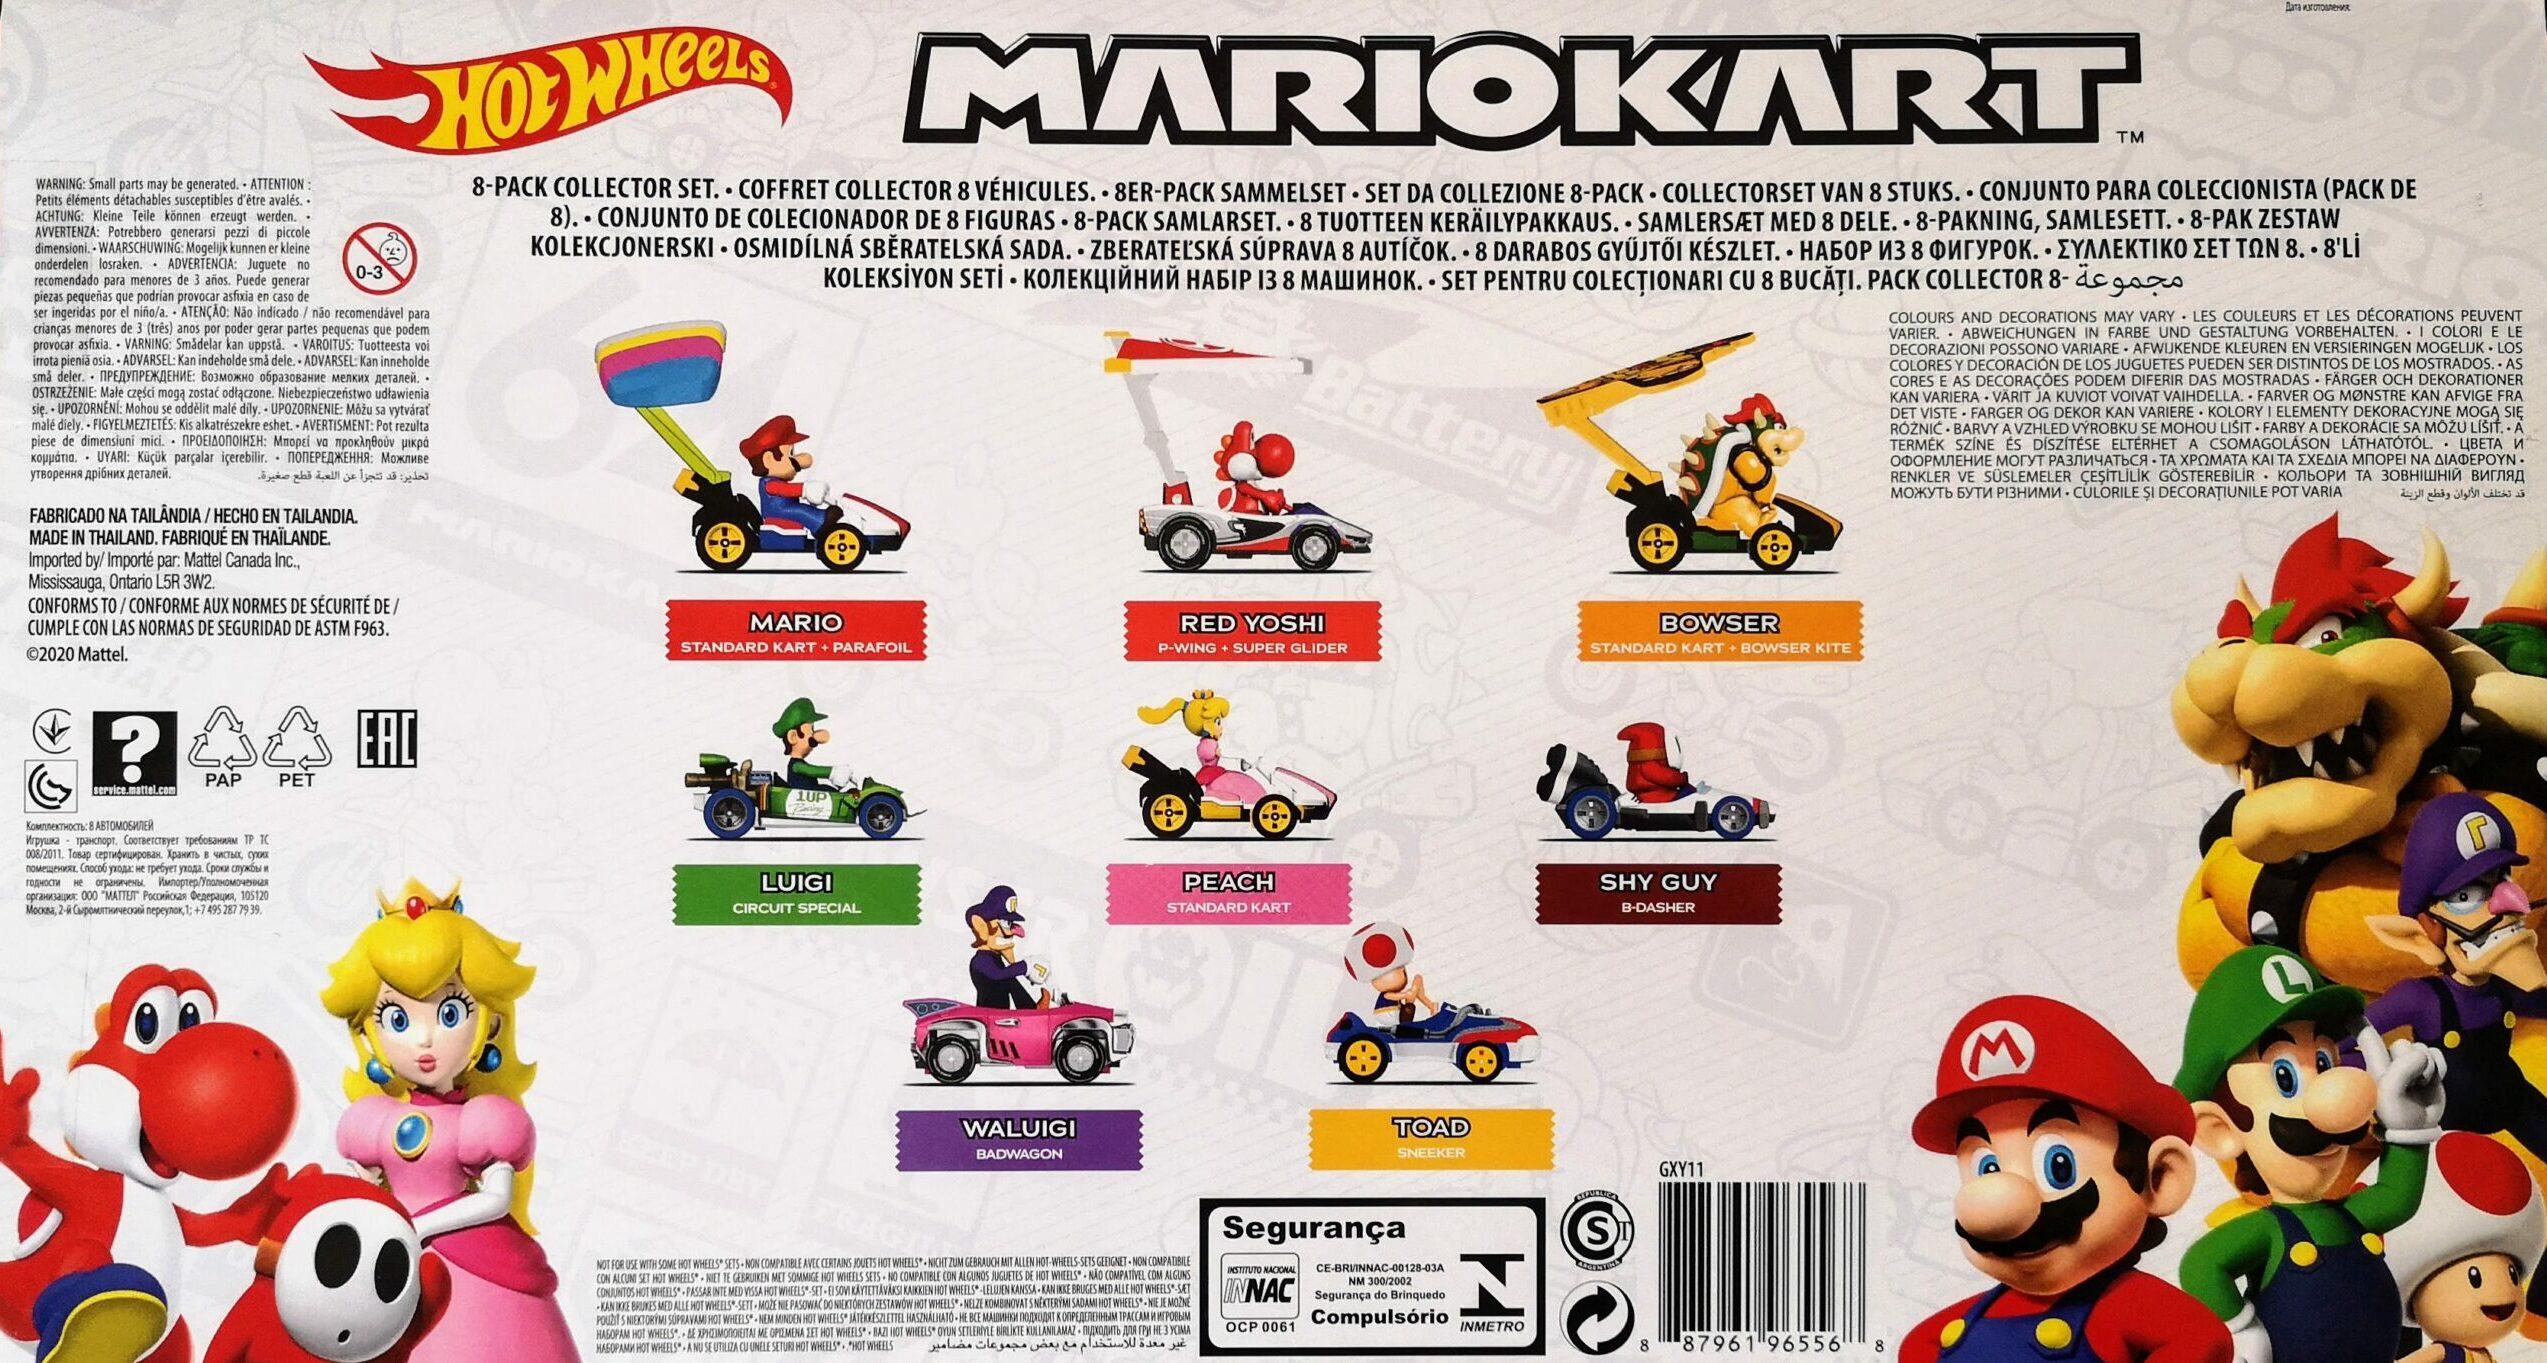 MarioKart 8-Pack Collector Set GXY11 back